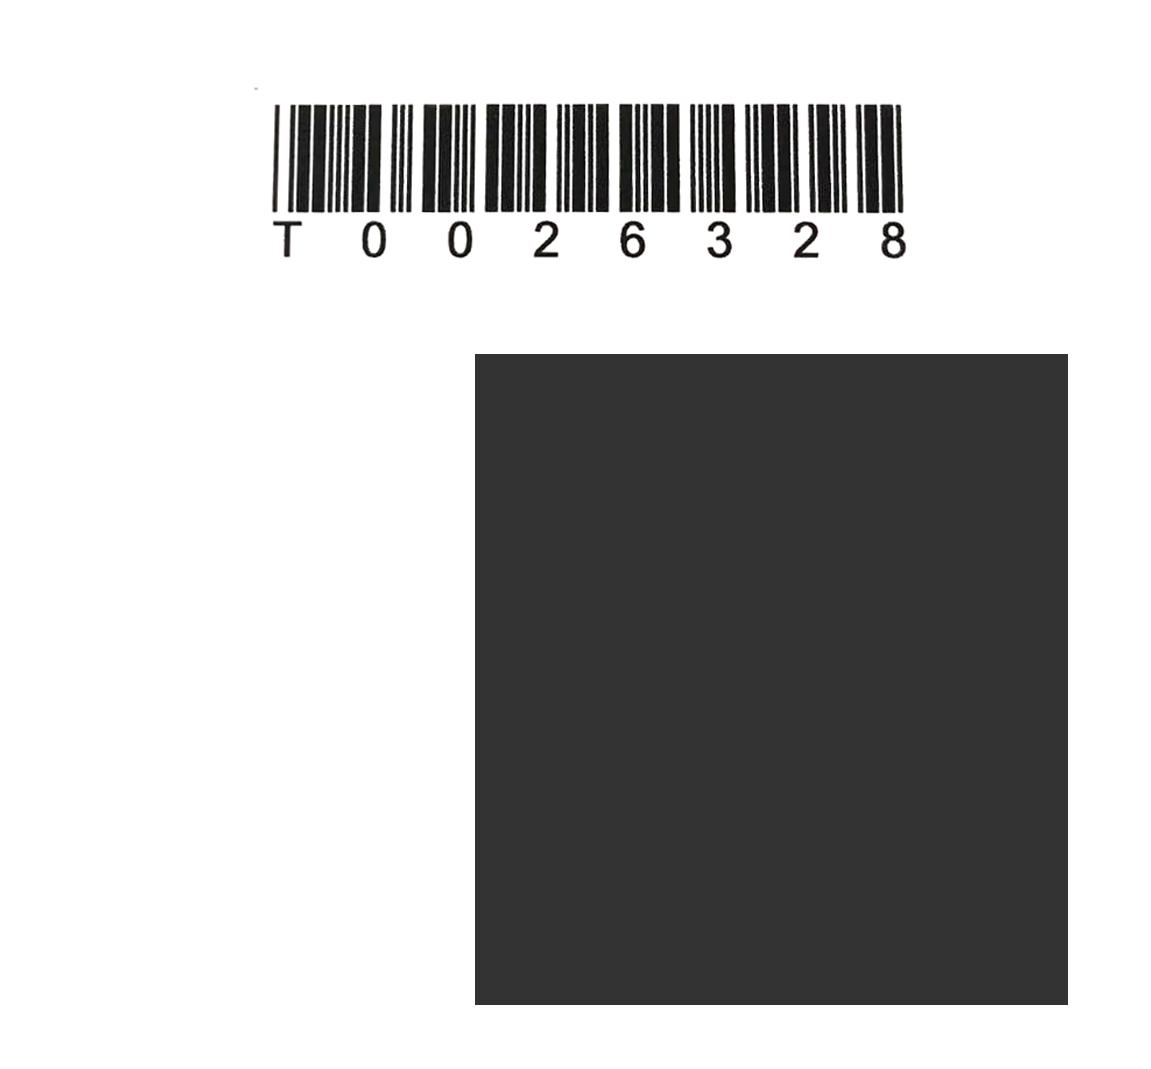 Symbol Identifizierung